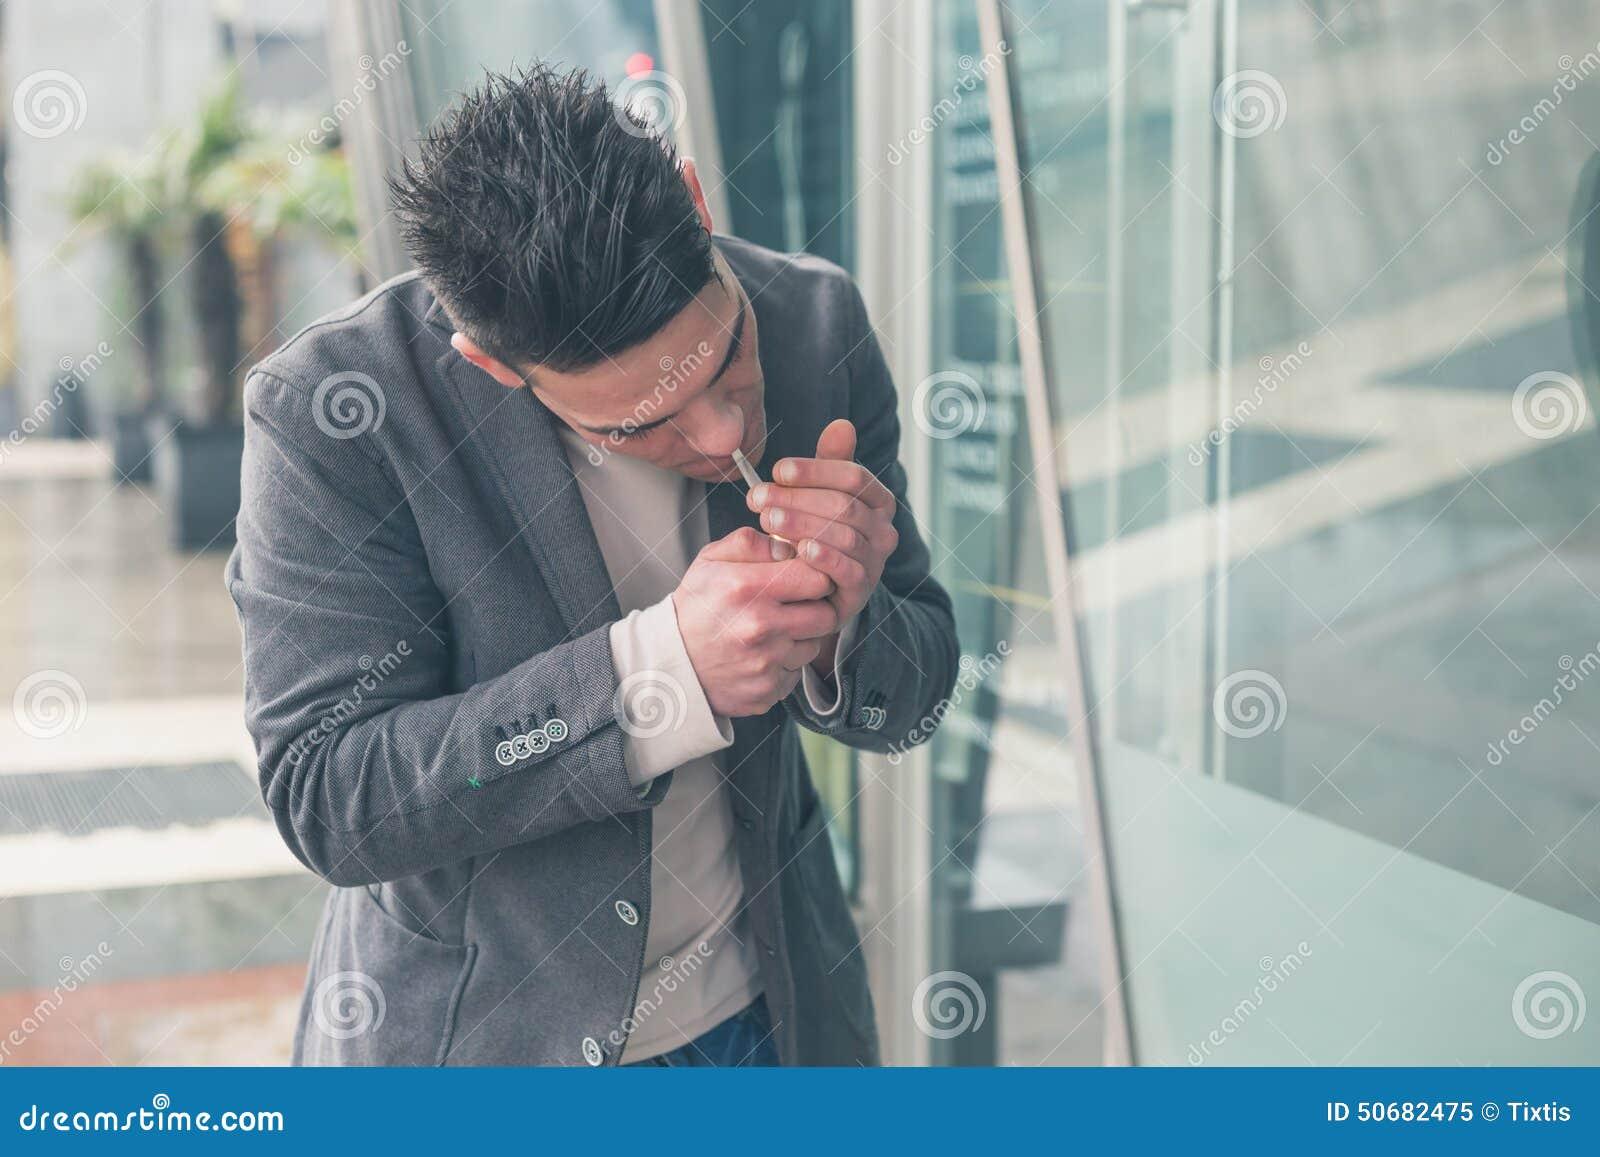 Download 抽香烟的年轻英俊的人 库存图片. 图片 包括有 有吸引力的, 英俊, 白种人, 生活方式, 人员, 照明设备 - 50682475